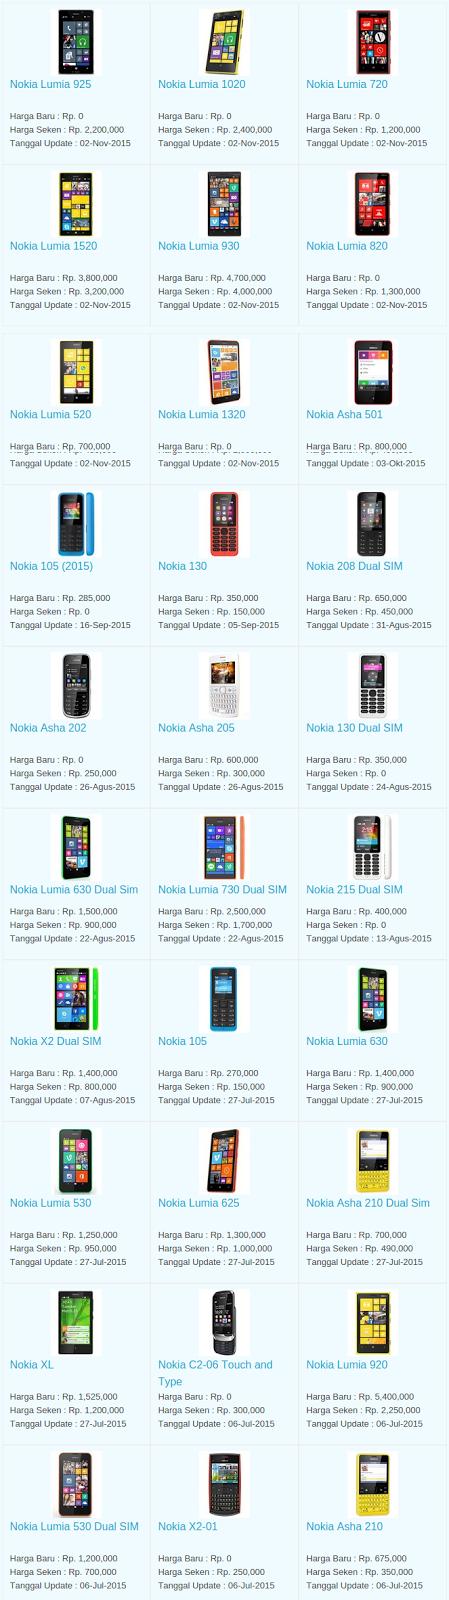 Daftar Harga Hp Nokia Desember 2015